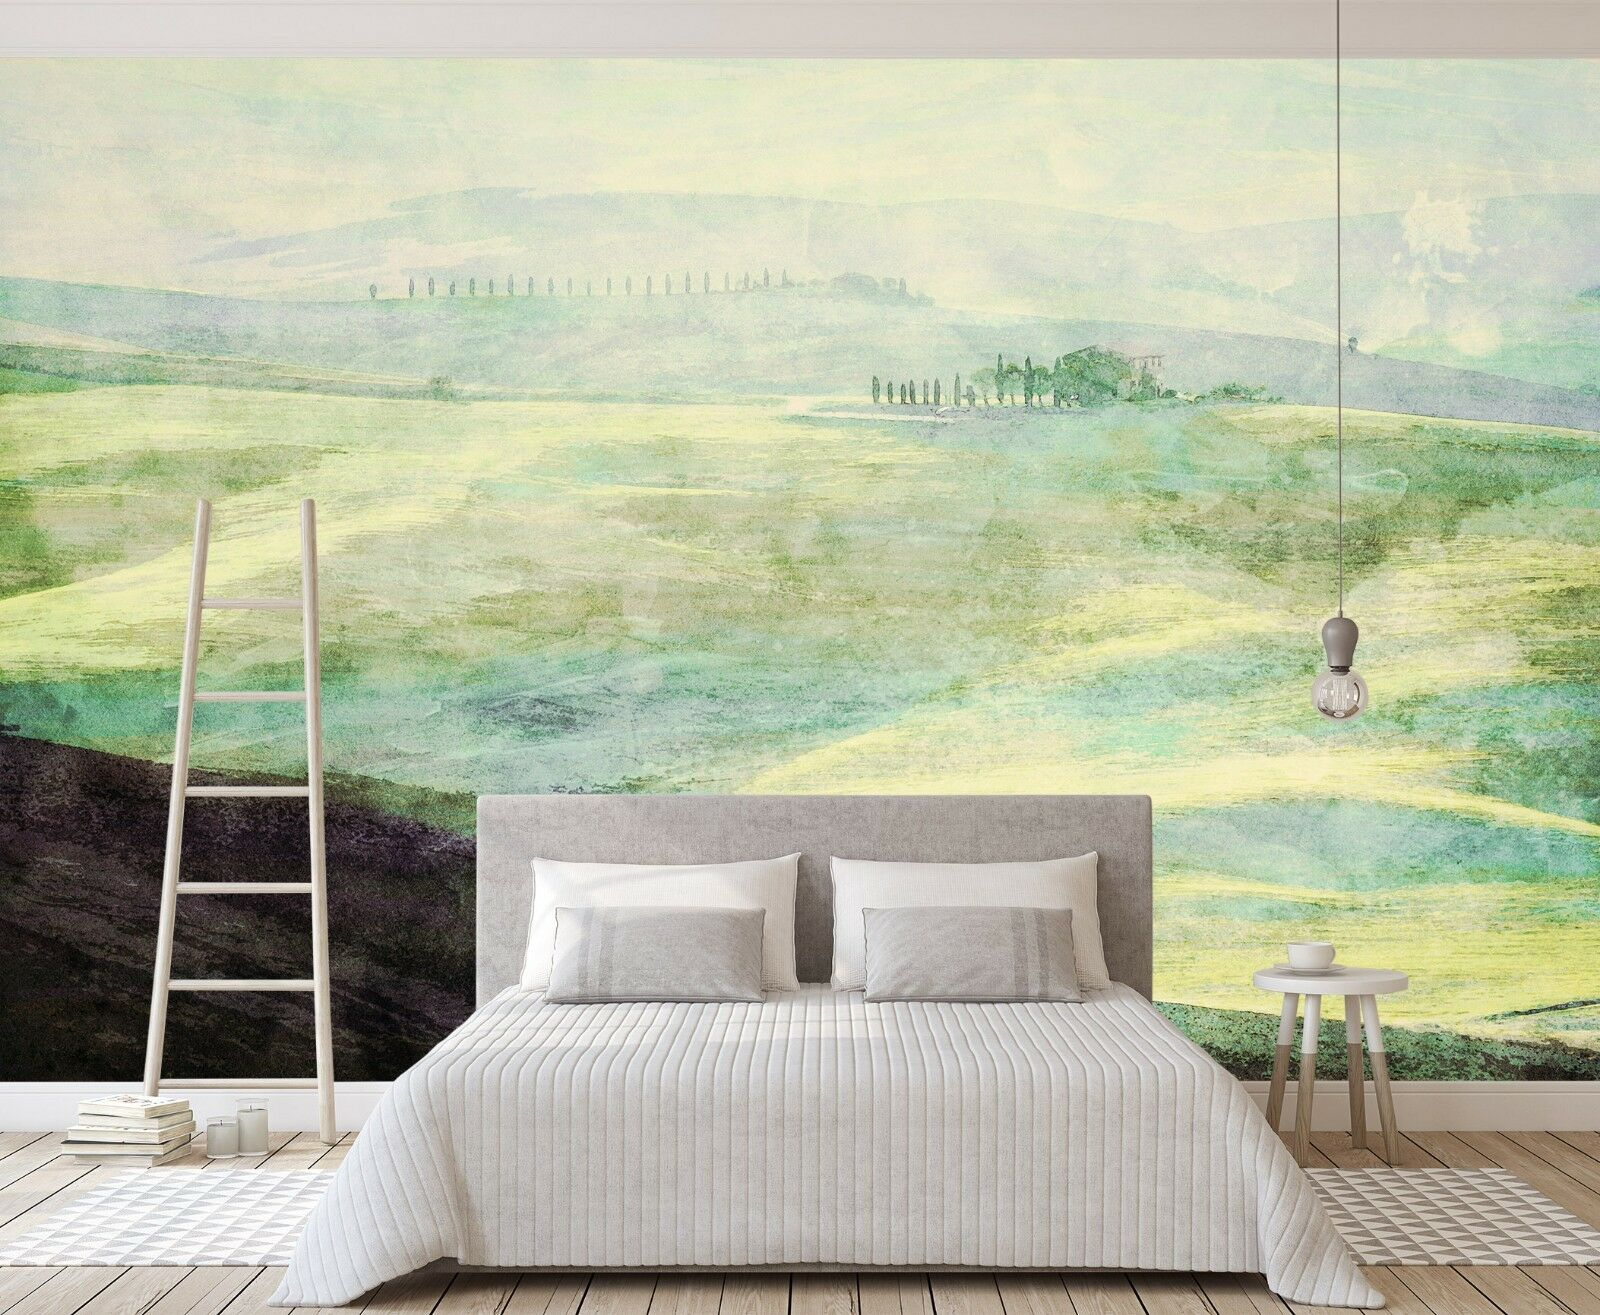 3D Painting Grassland Sky 226 WallPaper Murals Wall Decal WallPaper AU Jenny